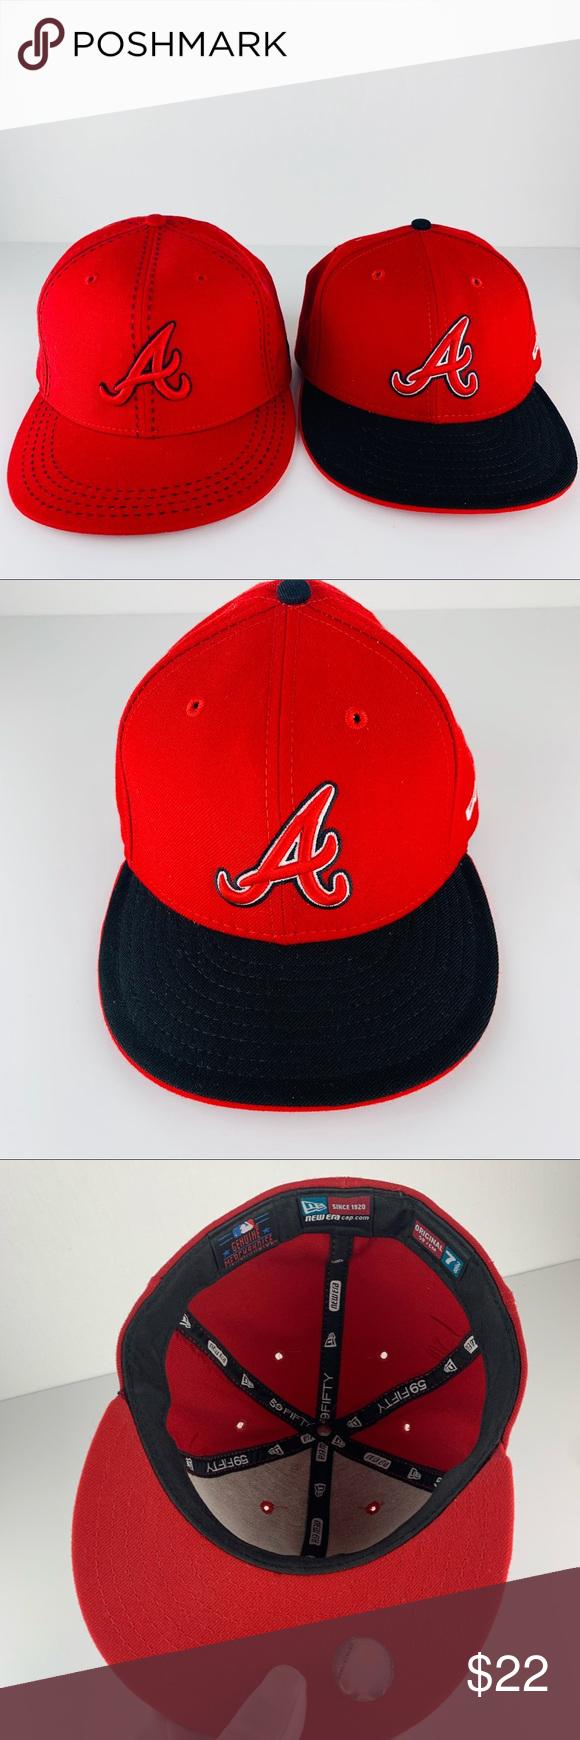 Men S Atlanta Braves New Era Navy Red Team Color 9fifty Snapback Hat In 2020 Atlanta Braves Red Team Braves